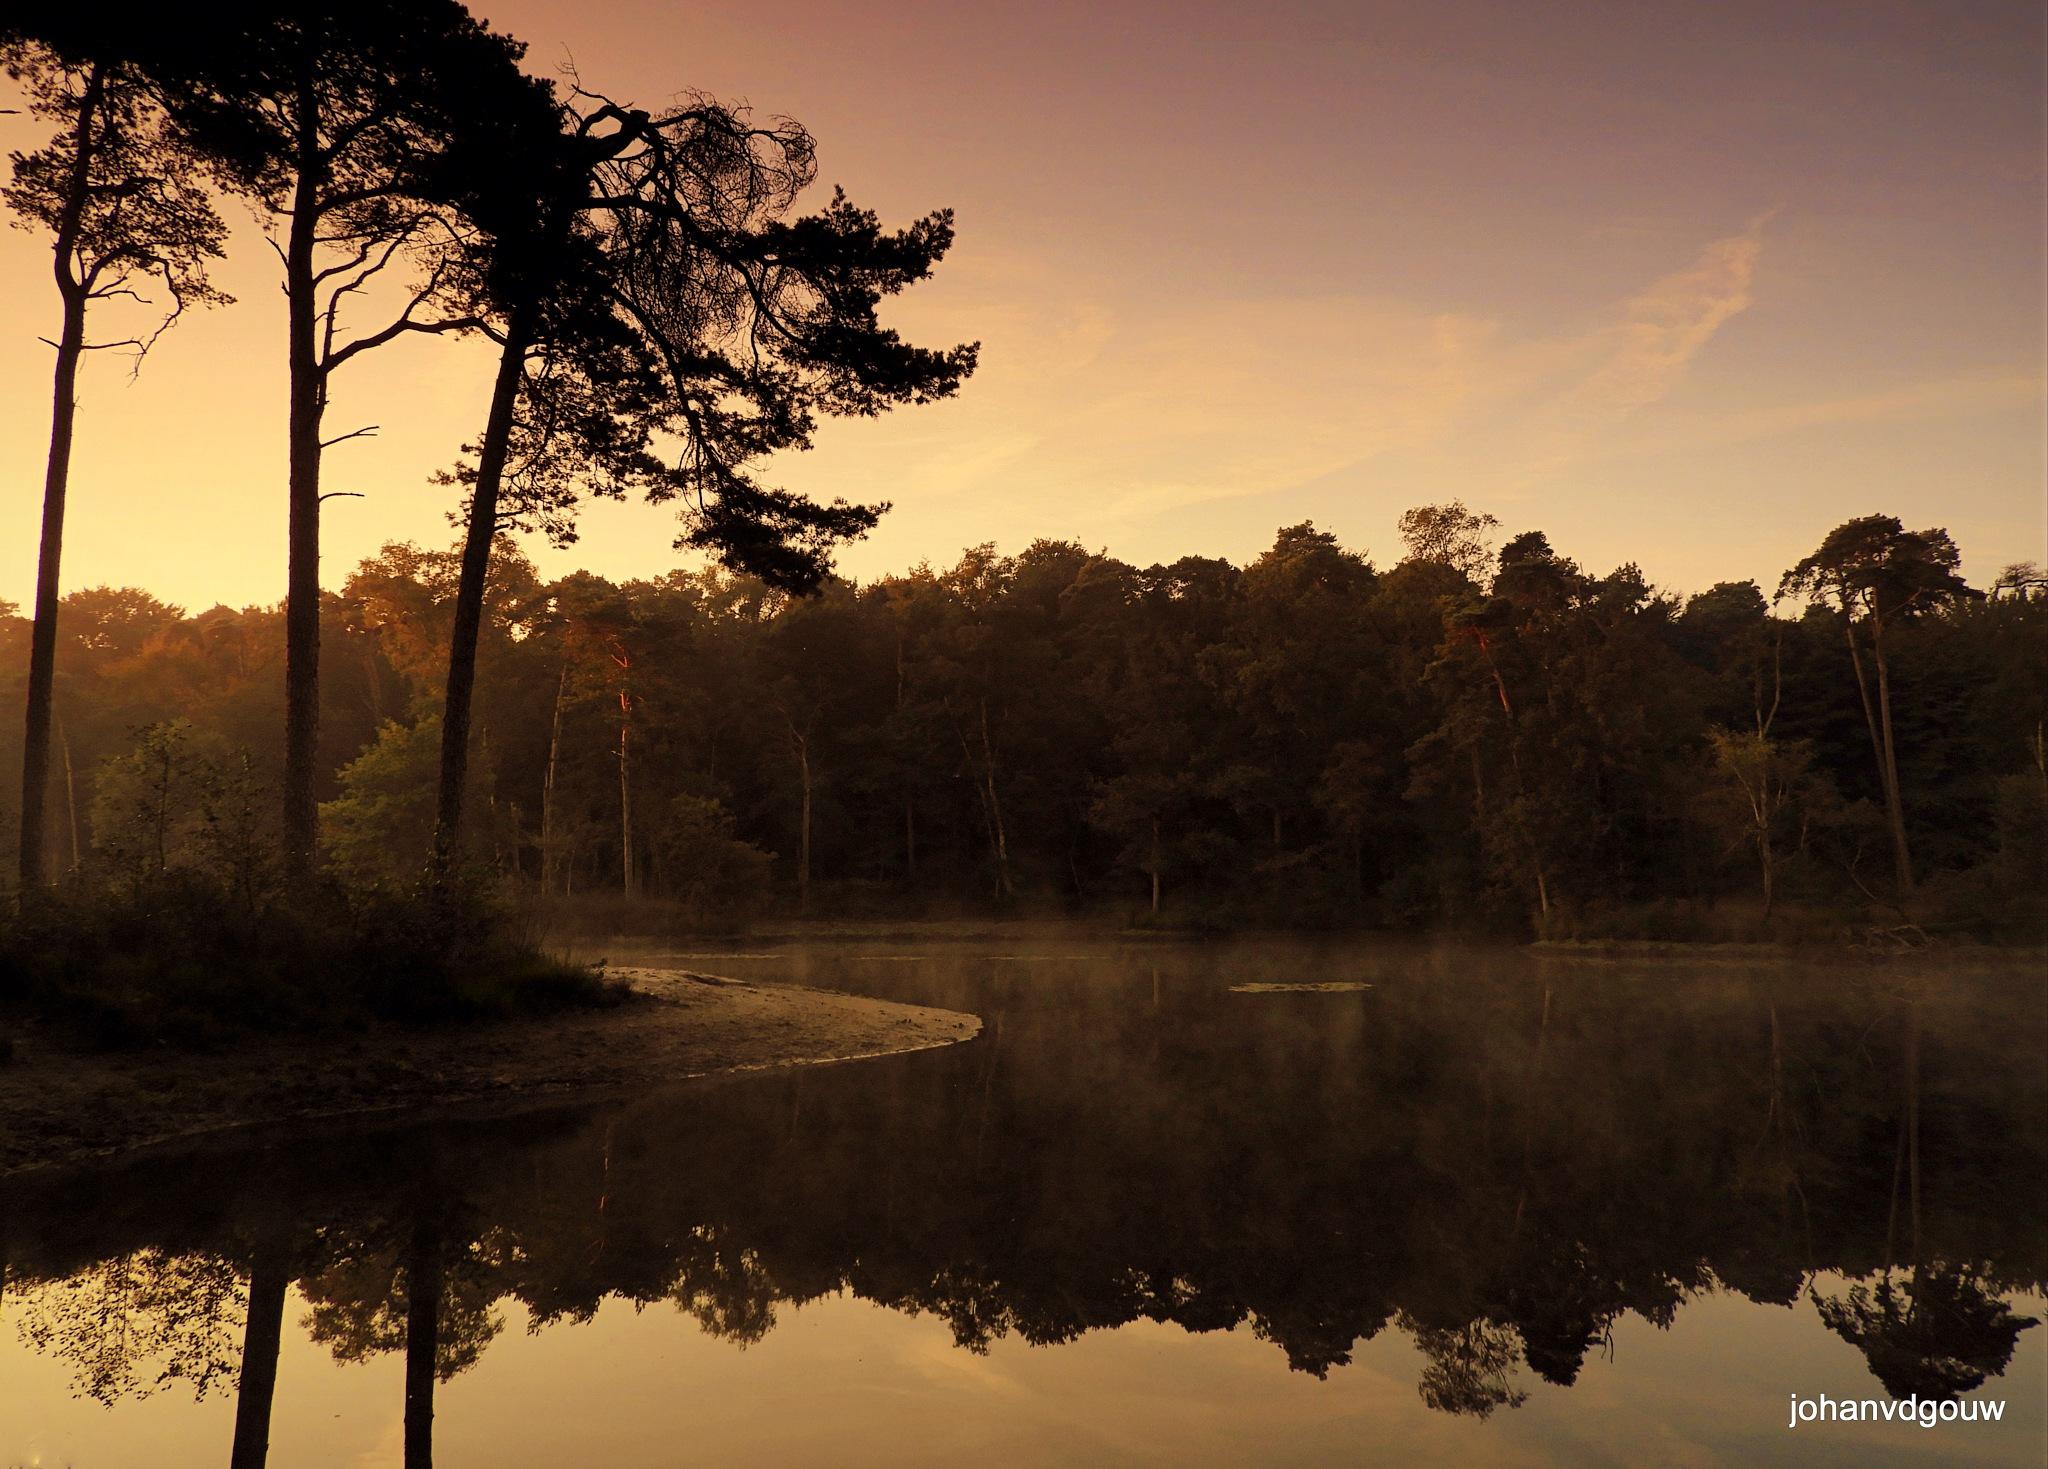 sunrise in Oisterwijk. by johan.vandergouw